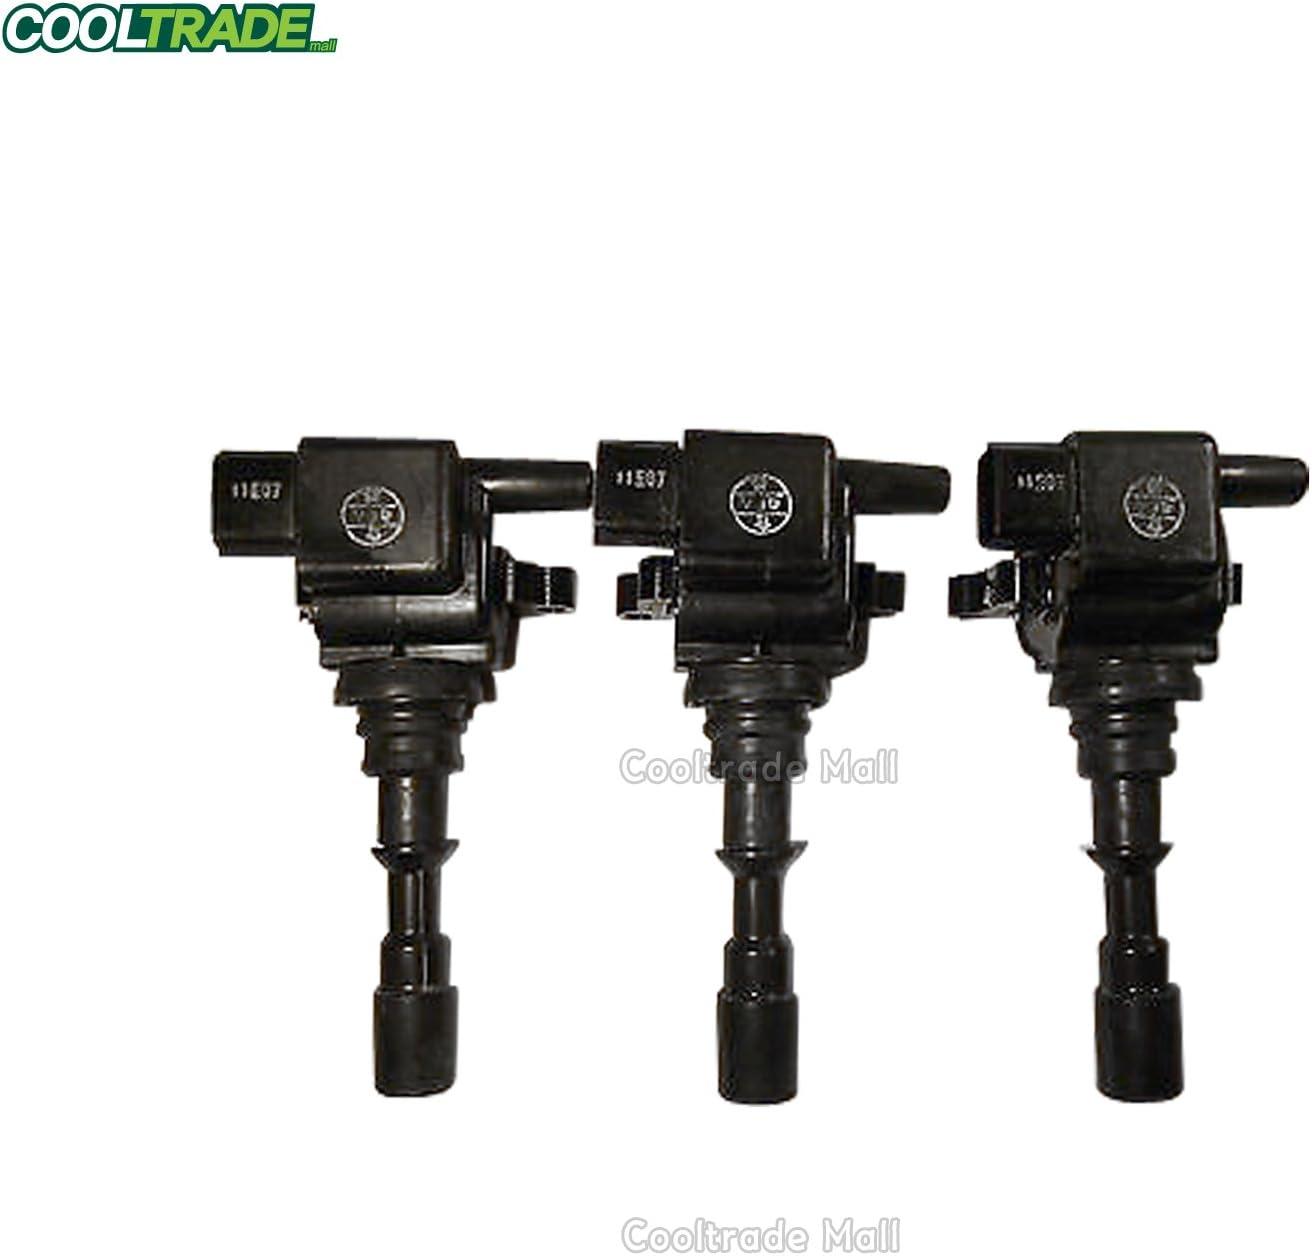 4 PCs DENSO OEM IGNITION COIL for 08-17 HYUNDAI KIA # 27300-3F100